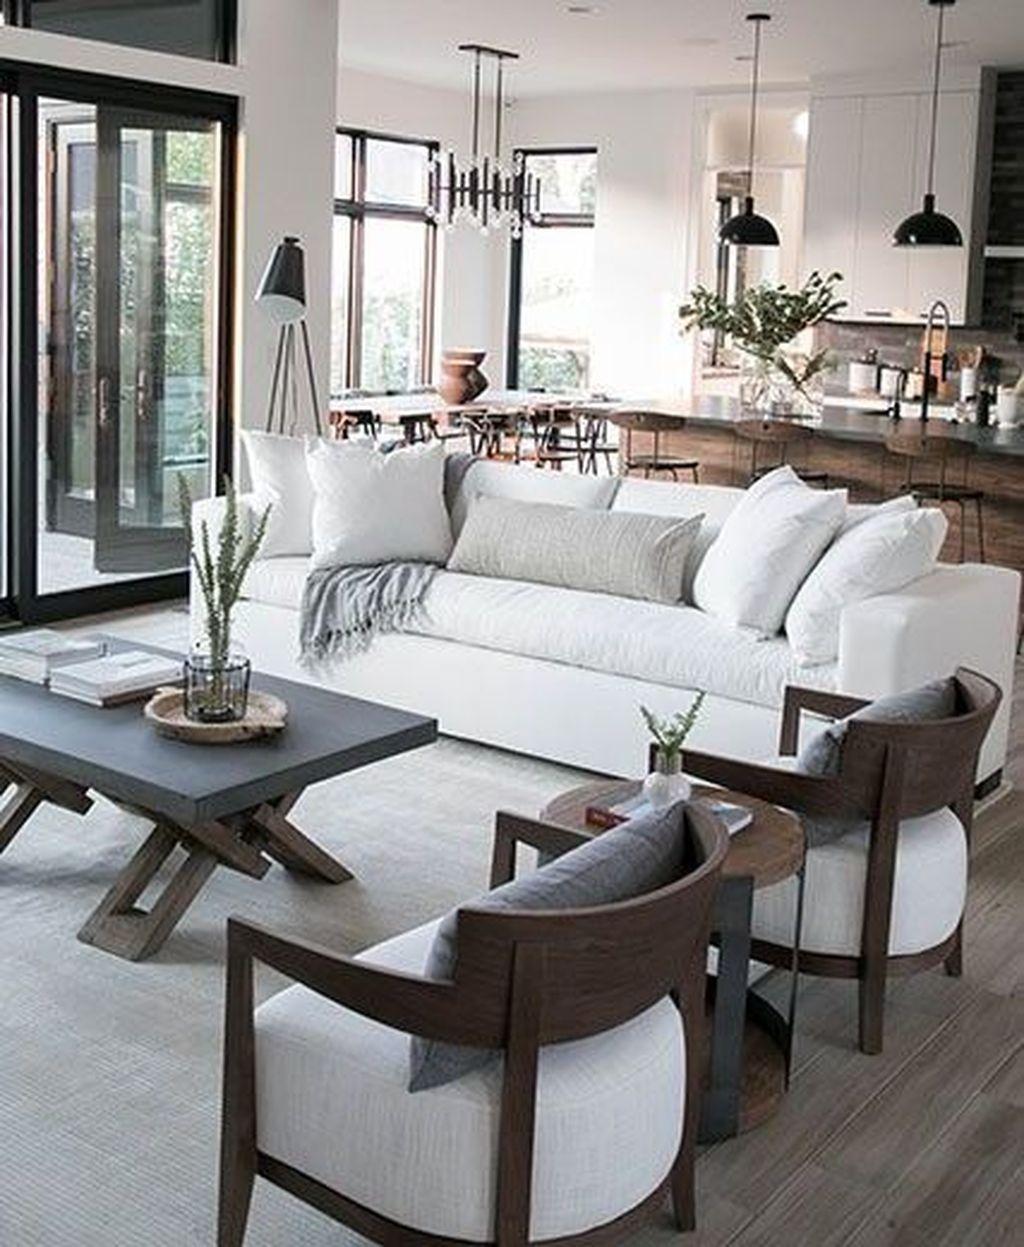 41 Amazing Open Plan Living Room Design Ideas #remodelingorroomdesign